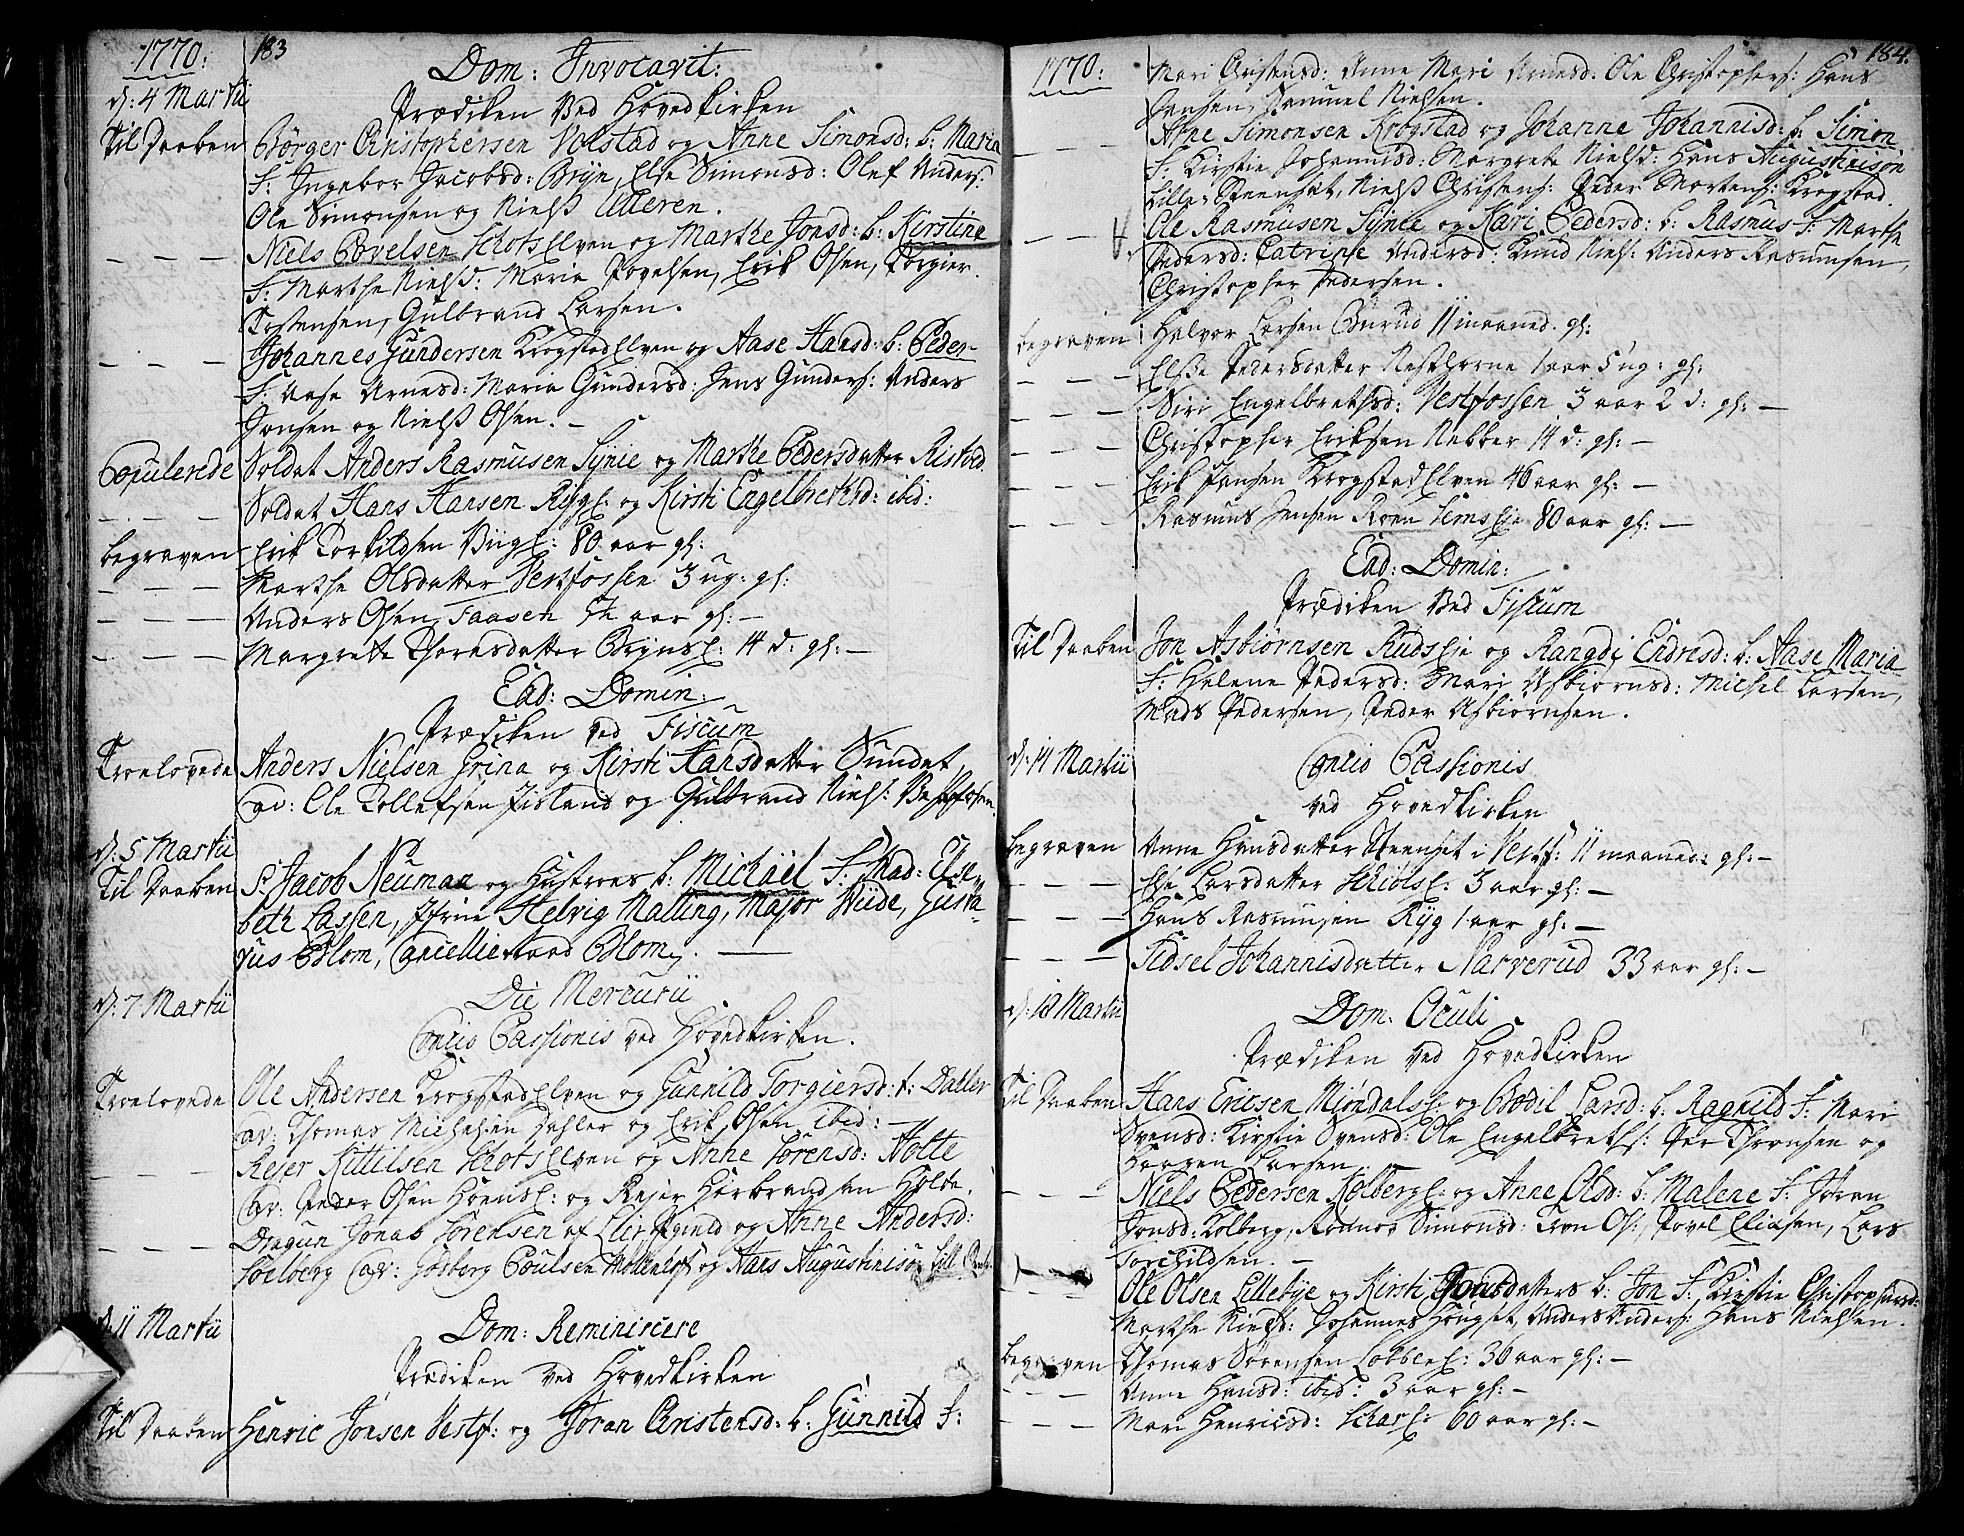 SAKO, Eiker kirkebøker, F/Fa/L0008: Ministerialbok nr. I 8, 1764-1788, s. 183-184